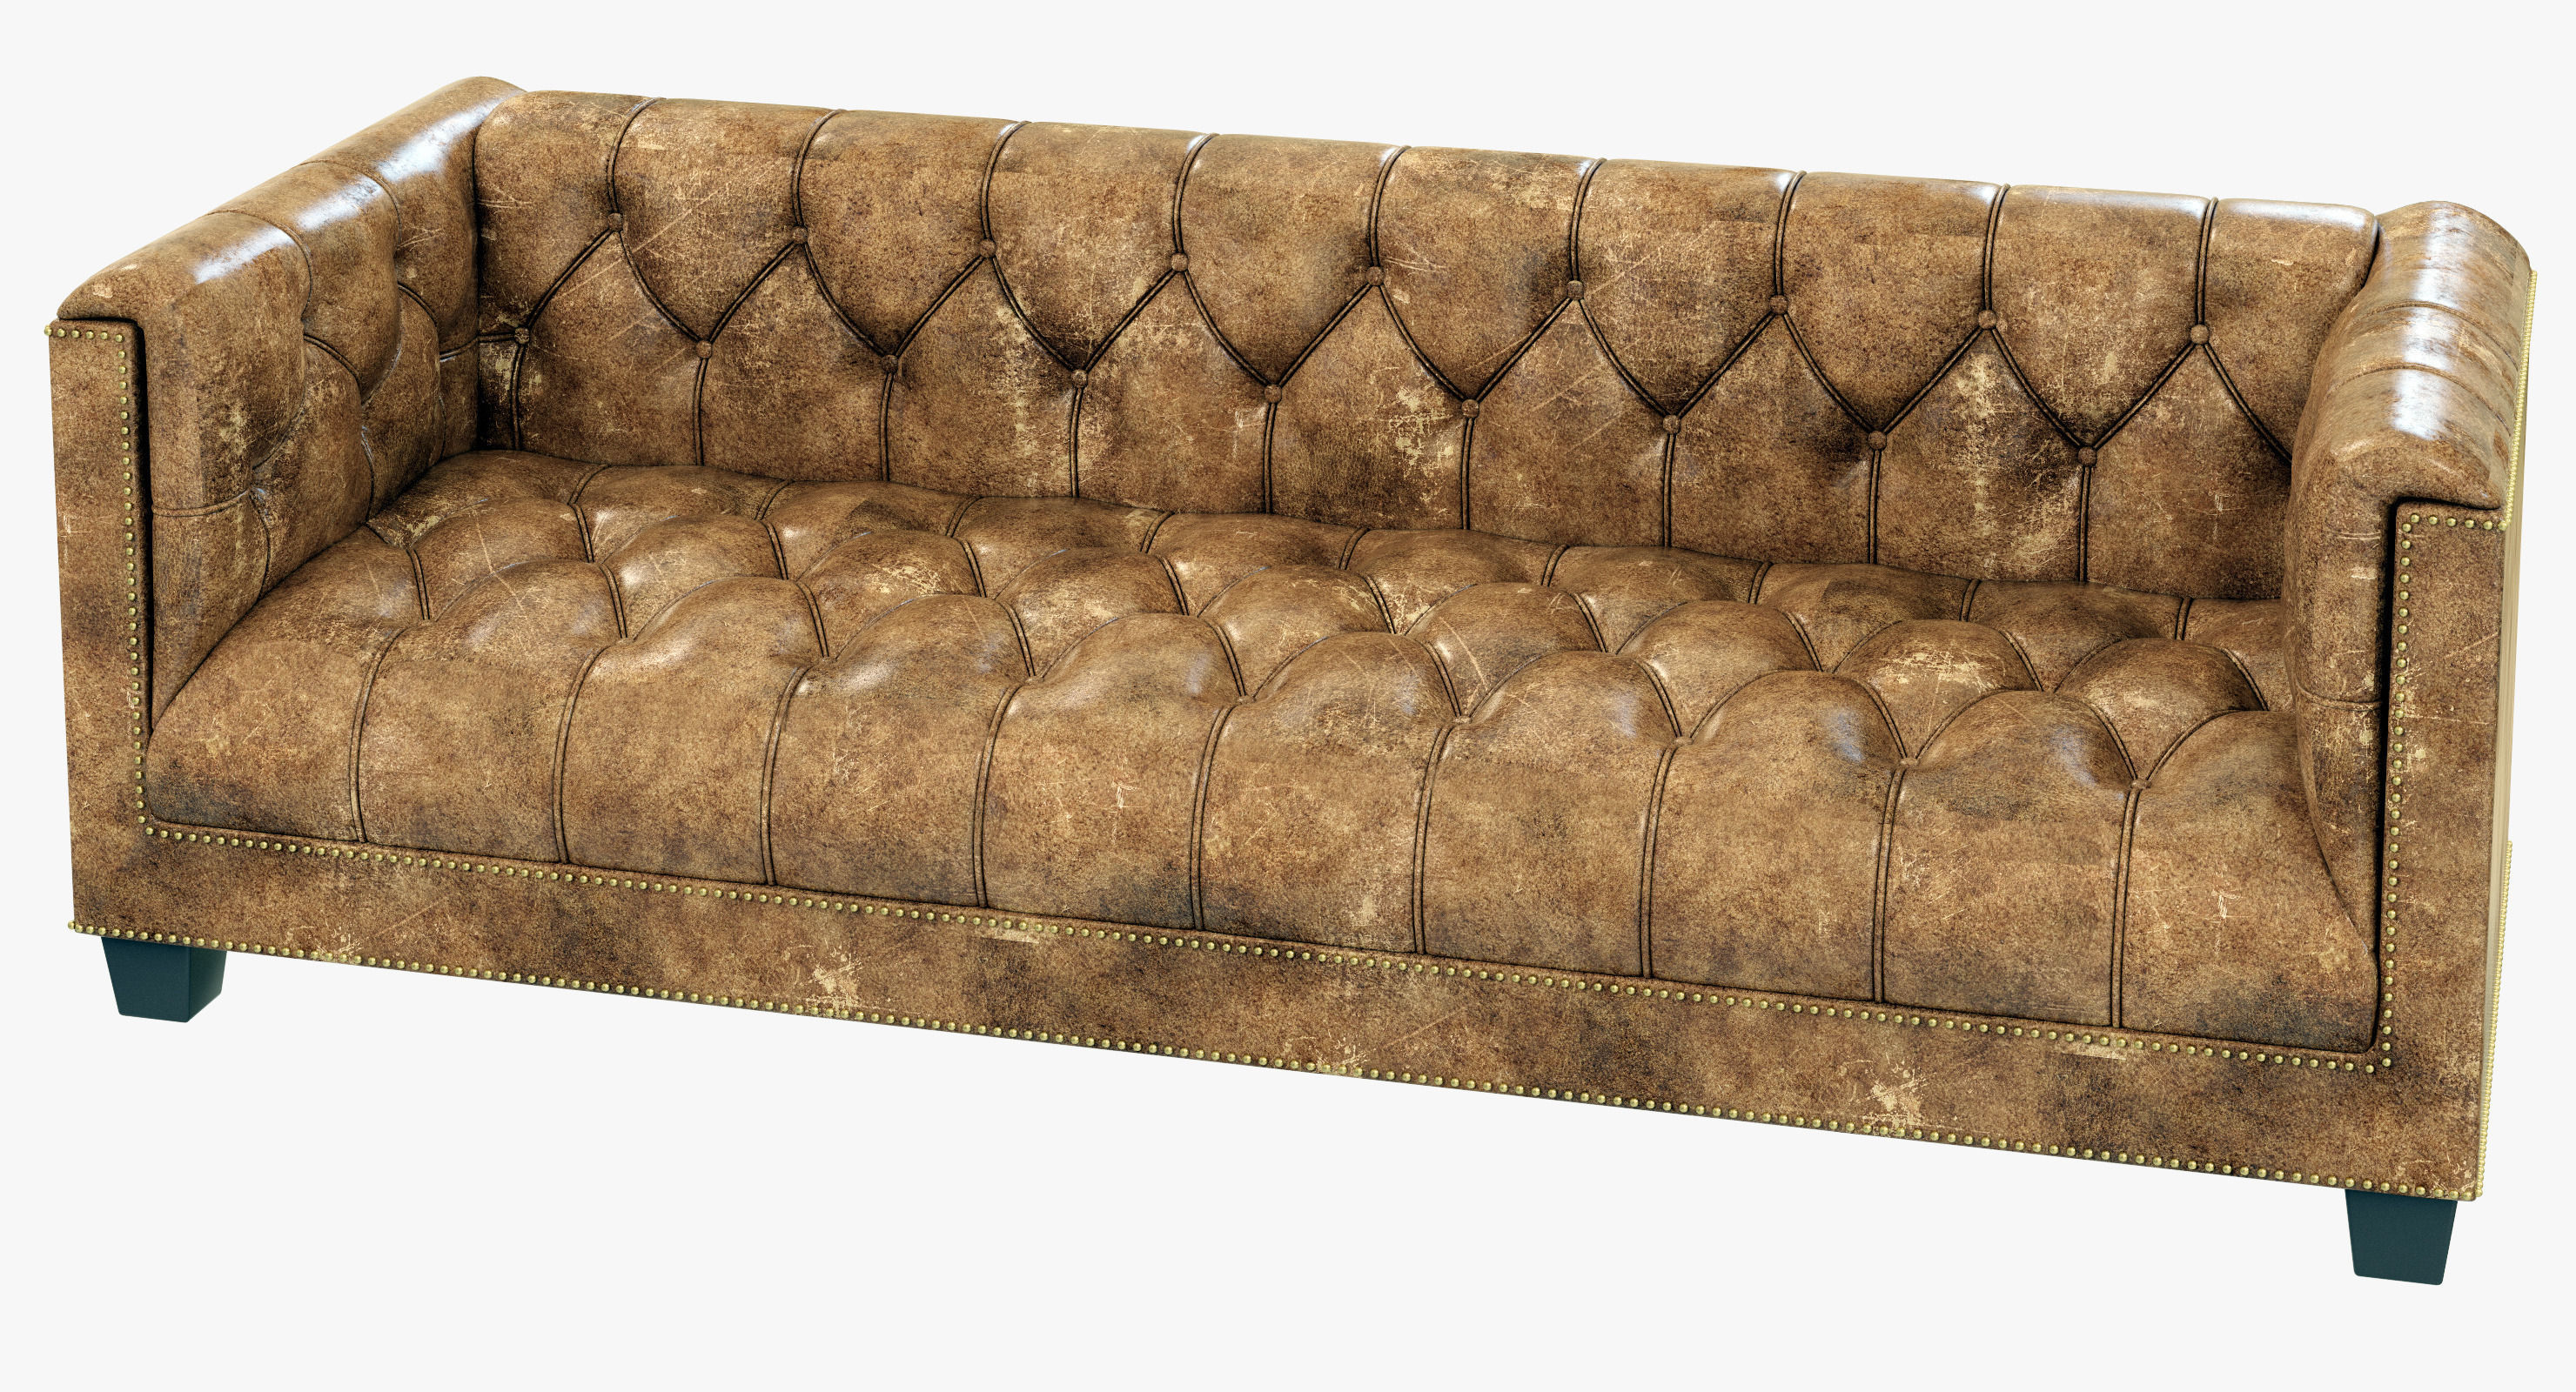 savoy leather sofa restoration hardware crypton 3d model max obj